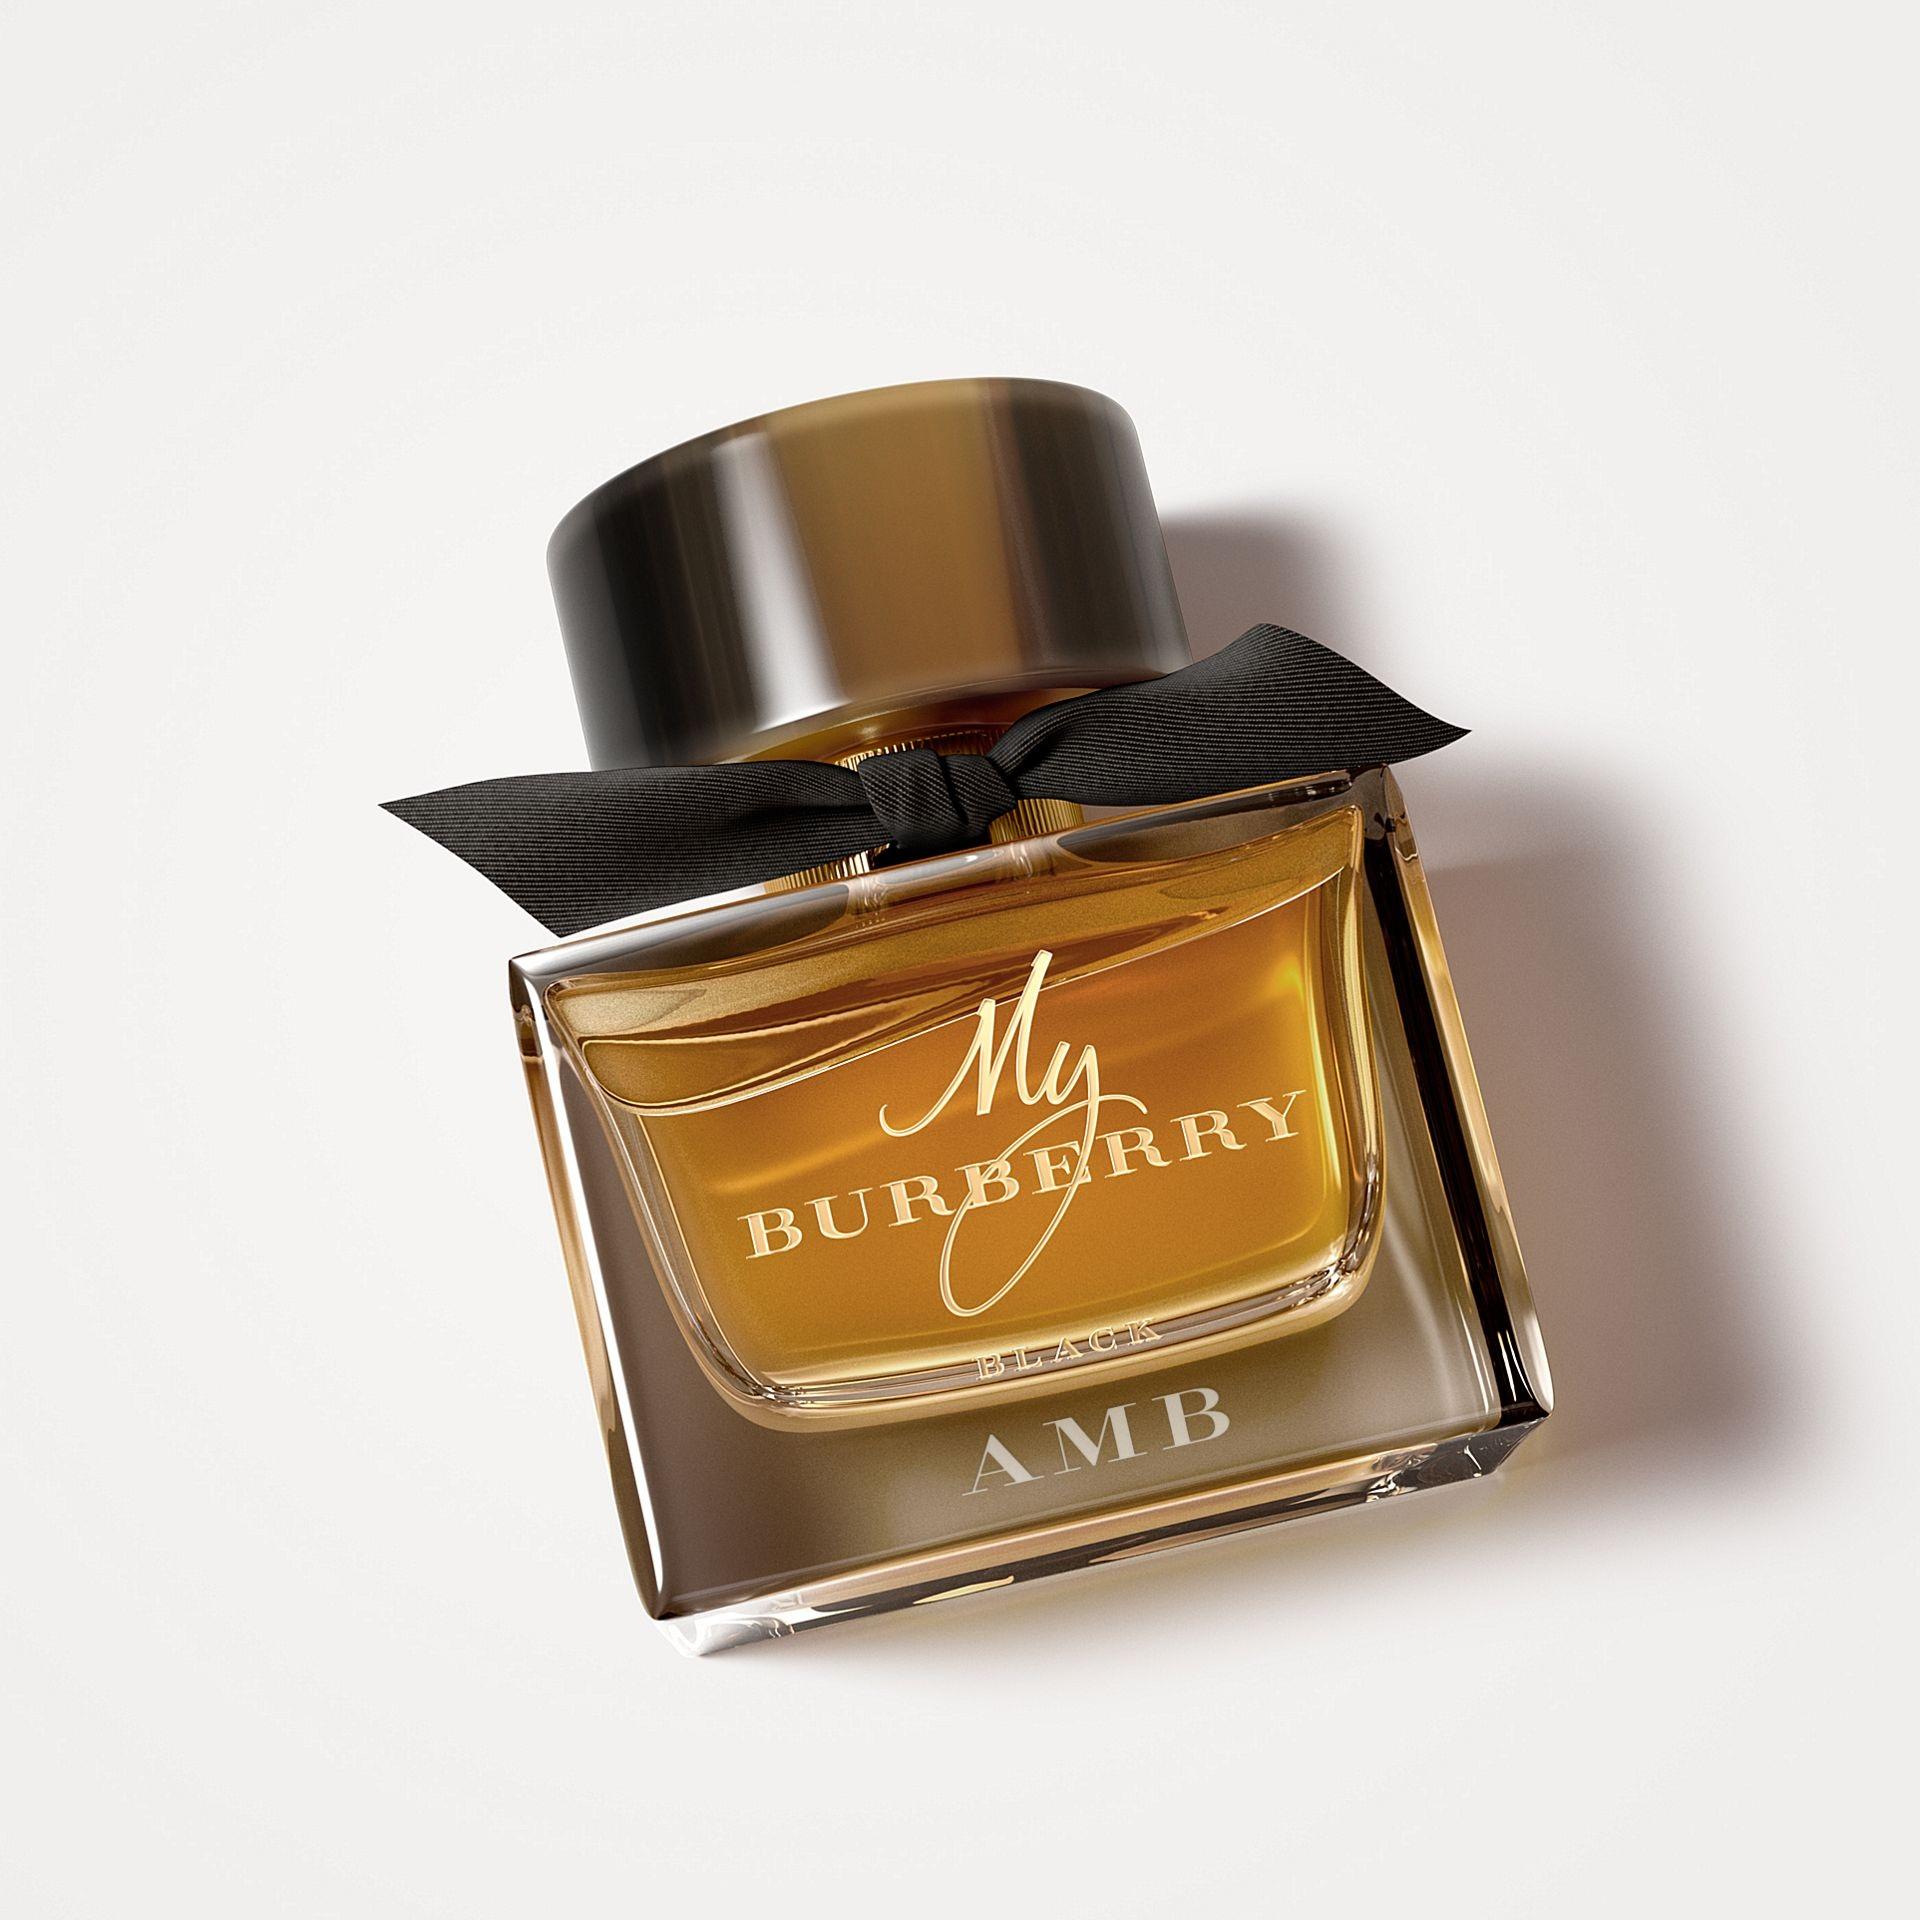 Burberry My Burberry Black Parfum